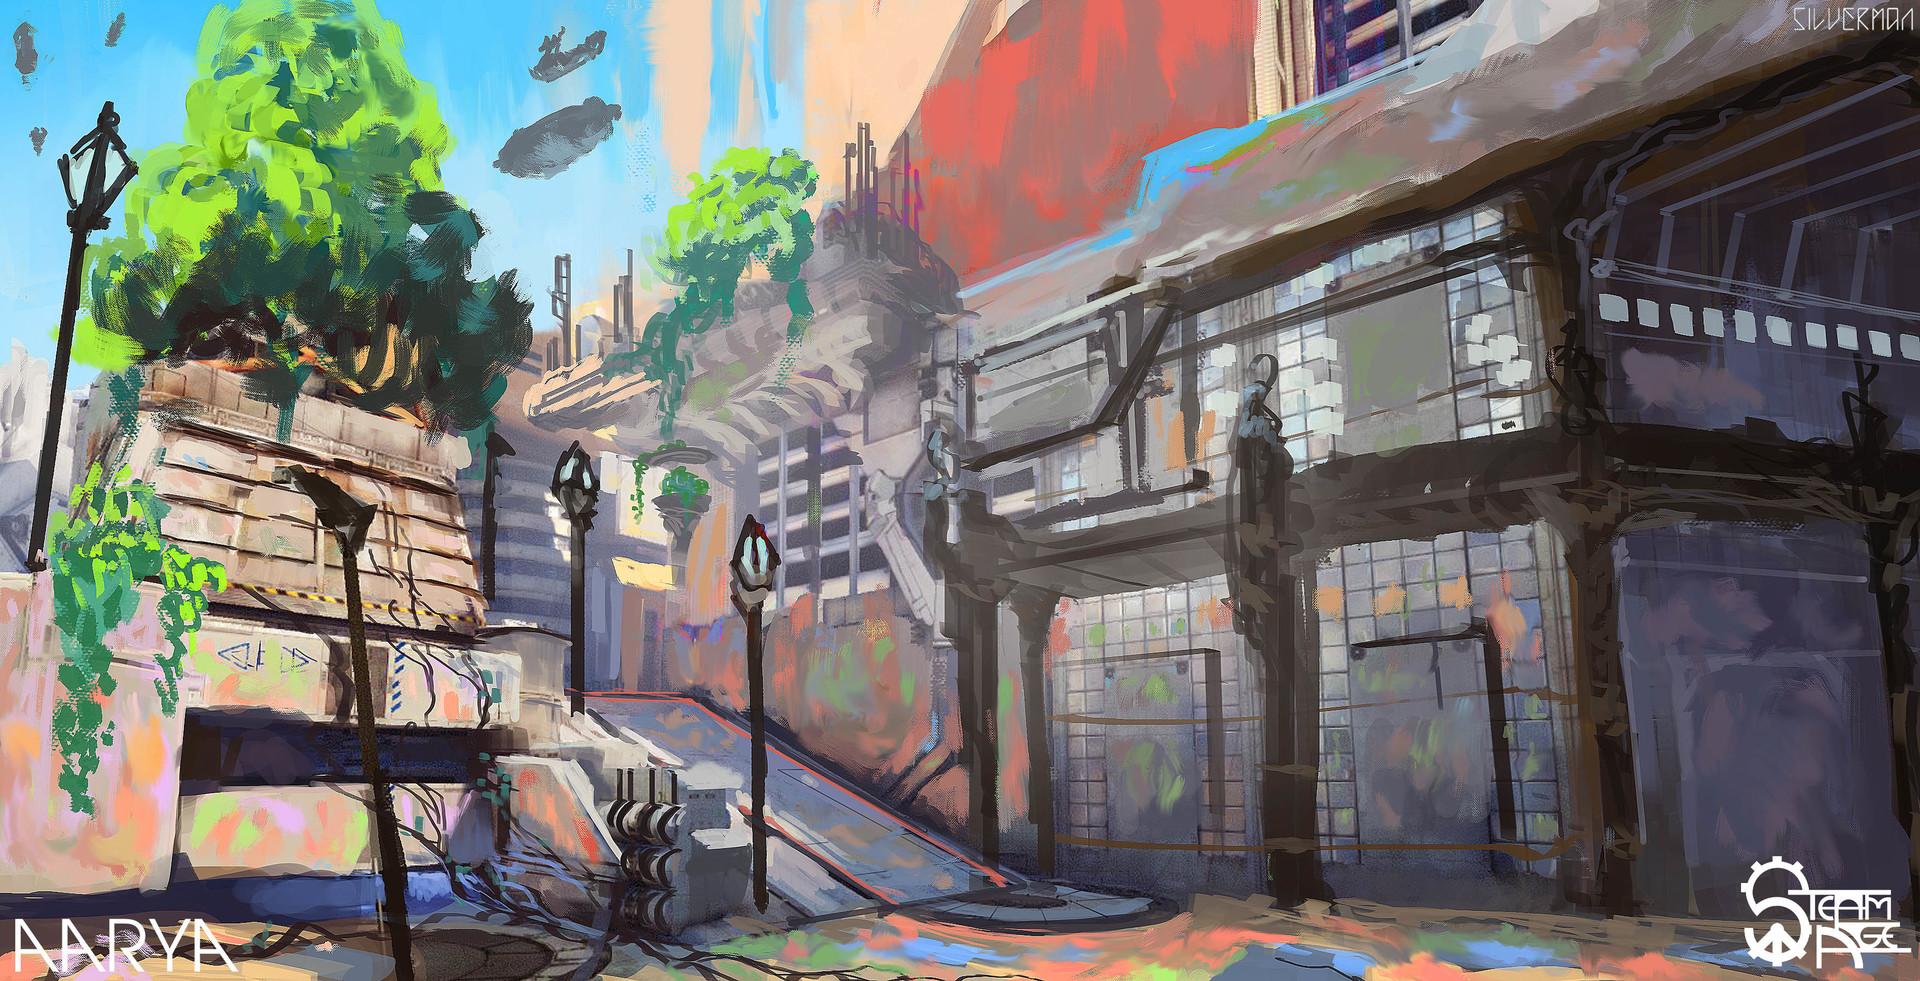 Samuel silverman aarya city concept 4